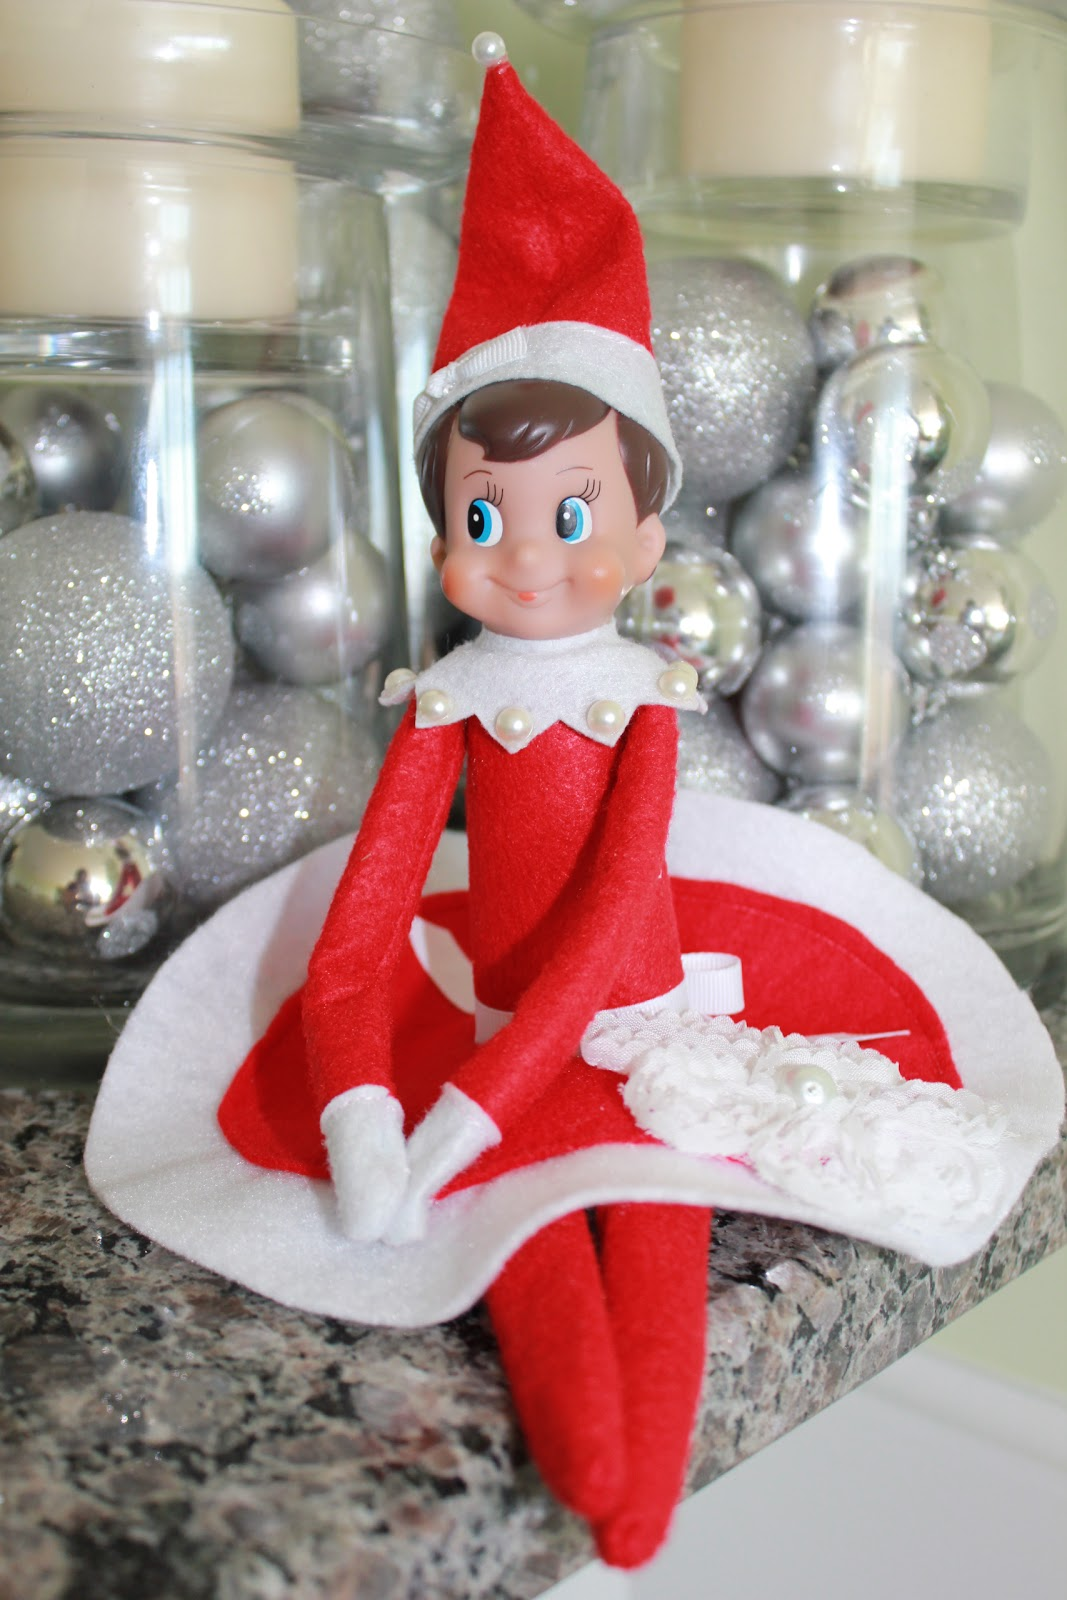 Cooper & Chloe: Elf on the Shelf: Bedazzled